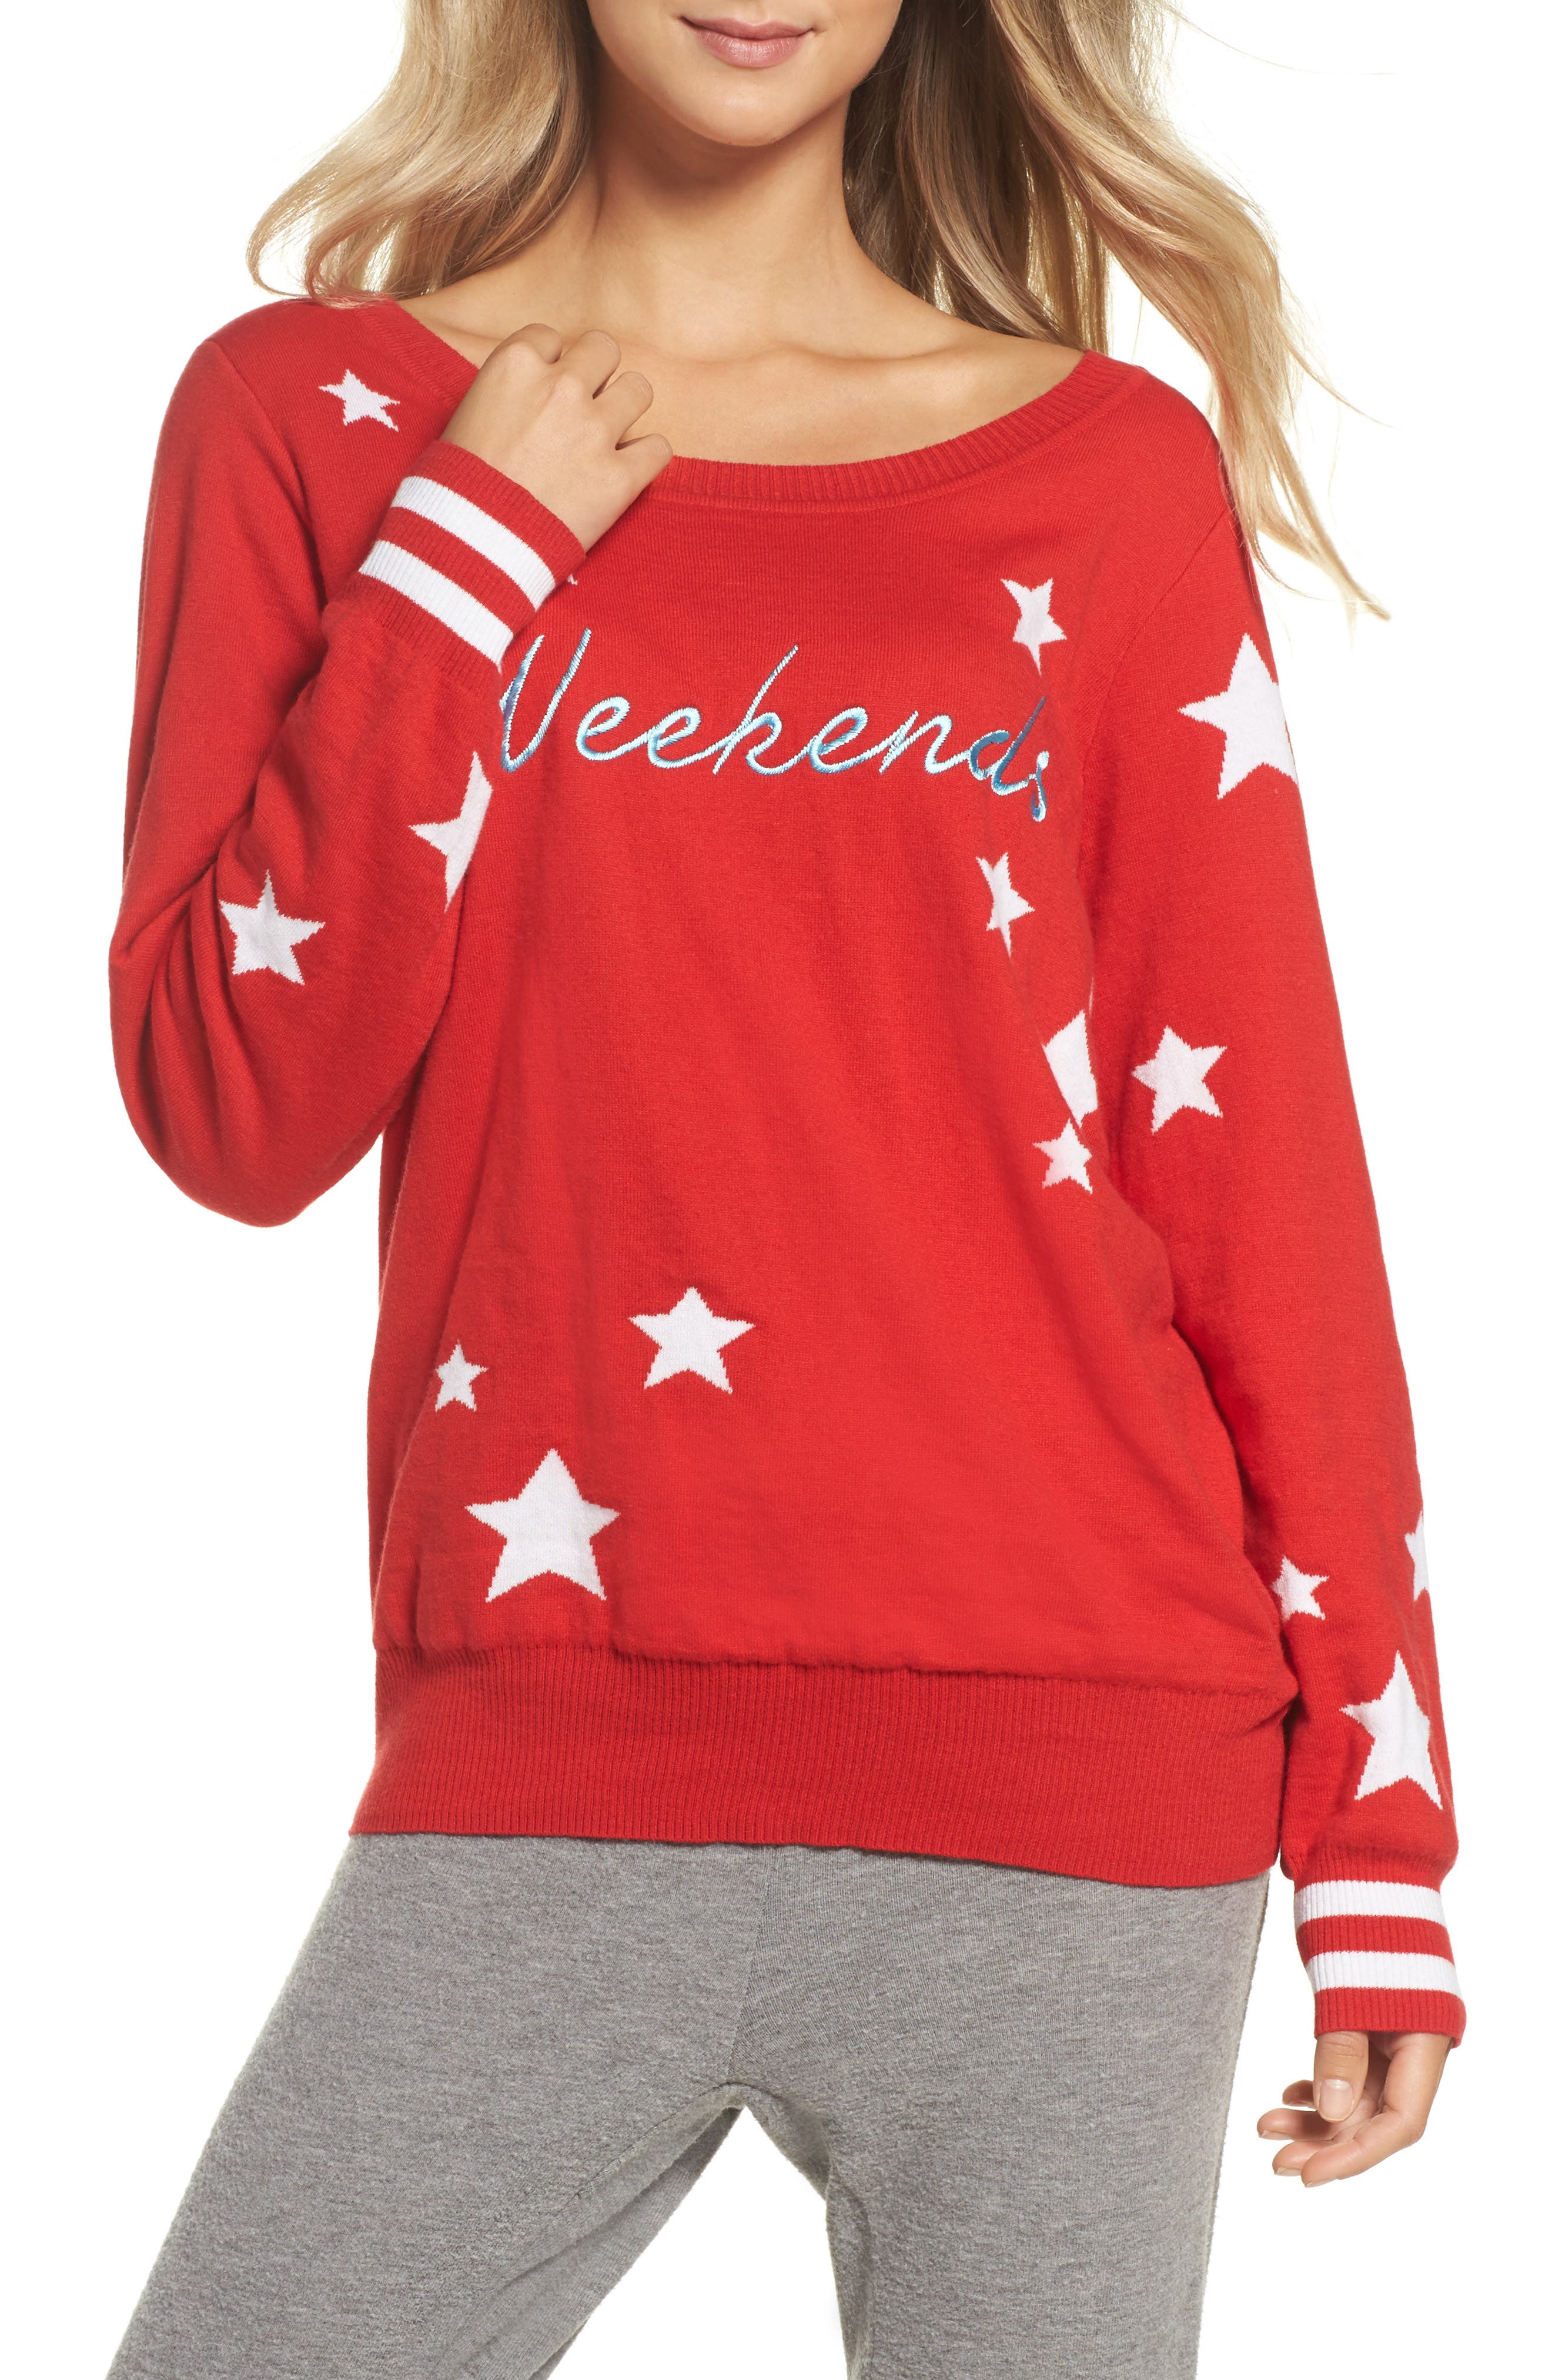 Weekends Intarsia Sweater,                             Main thumbnail 1, color,                             608